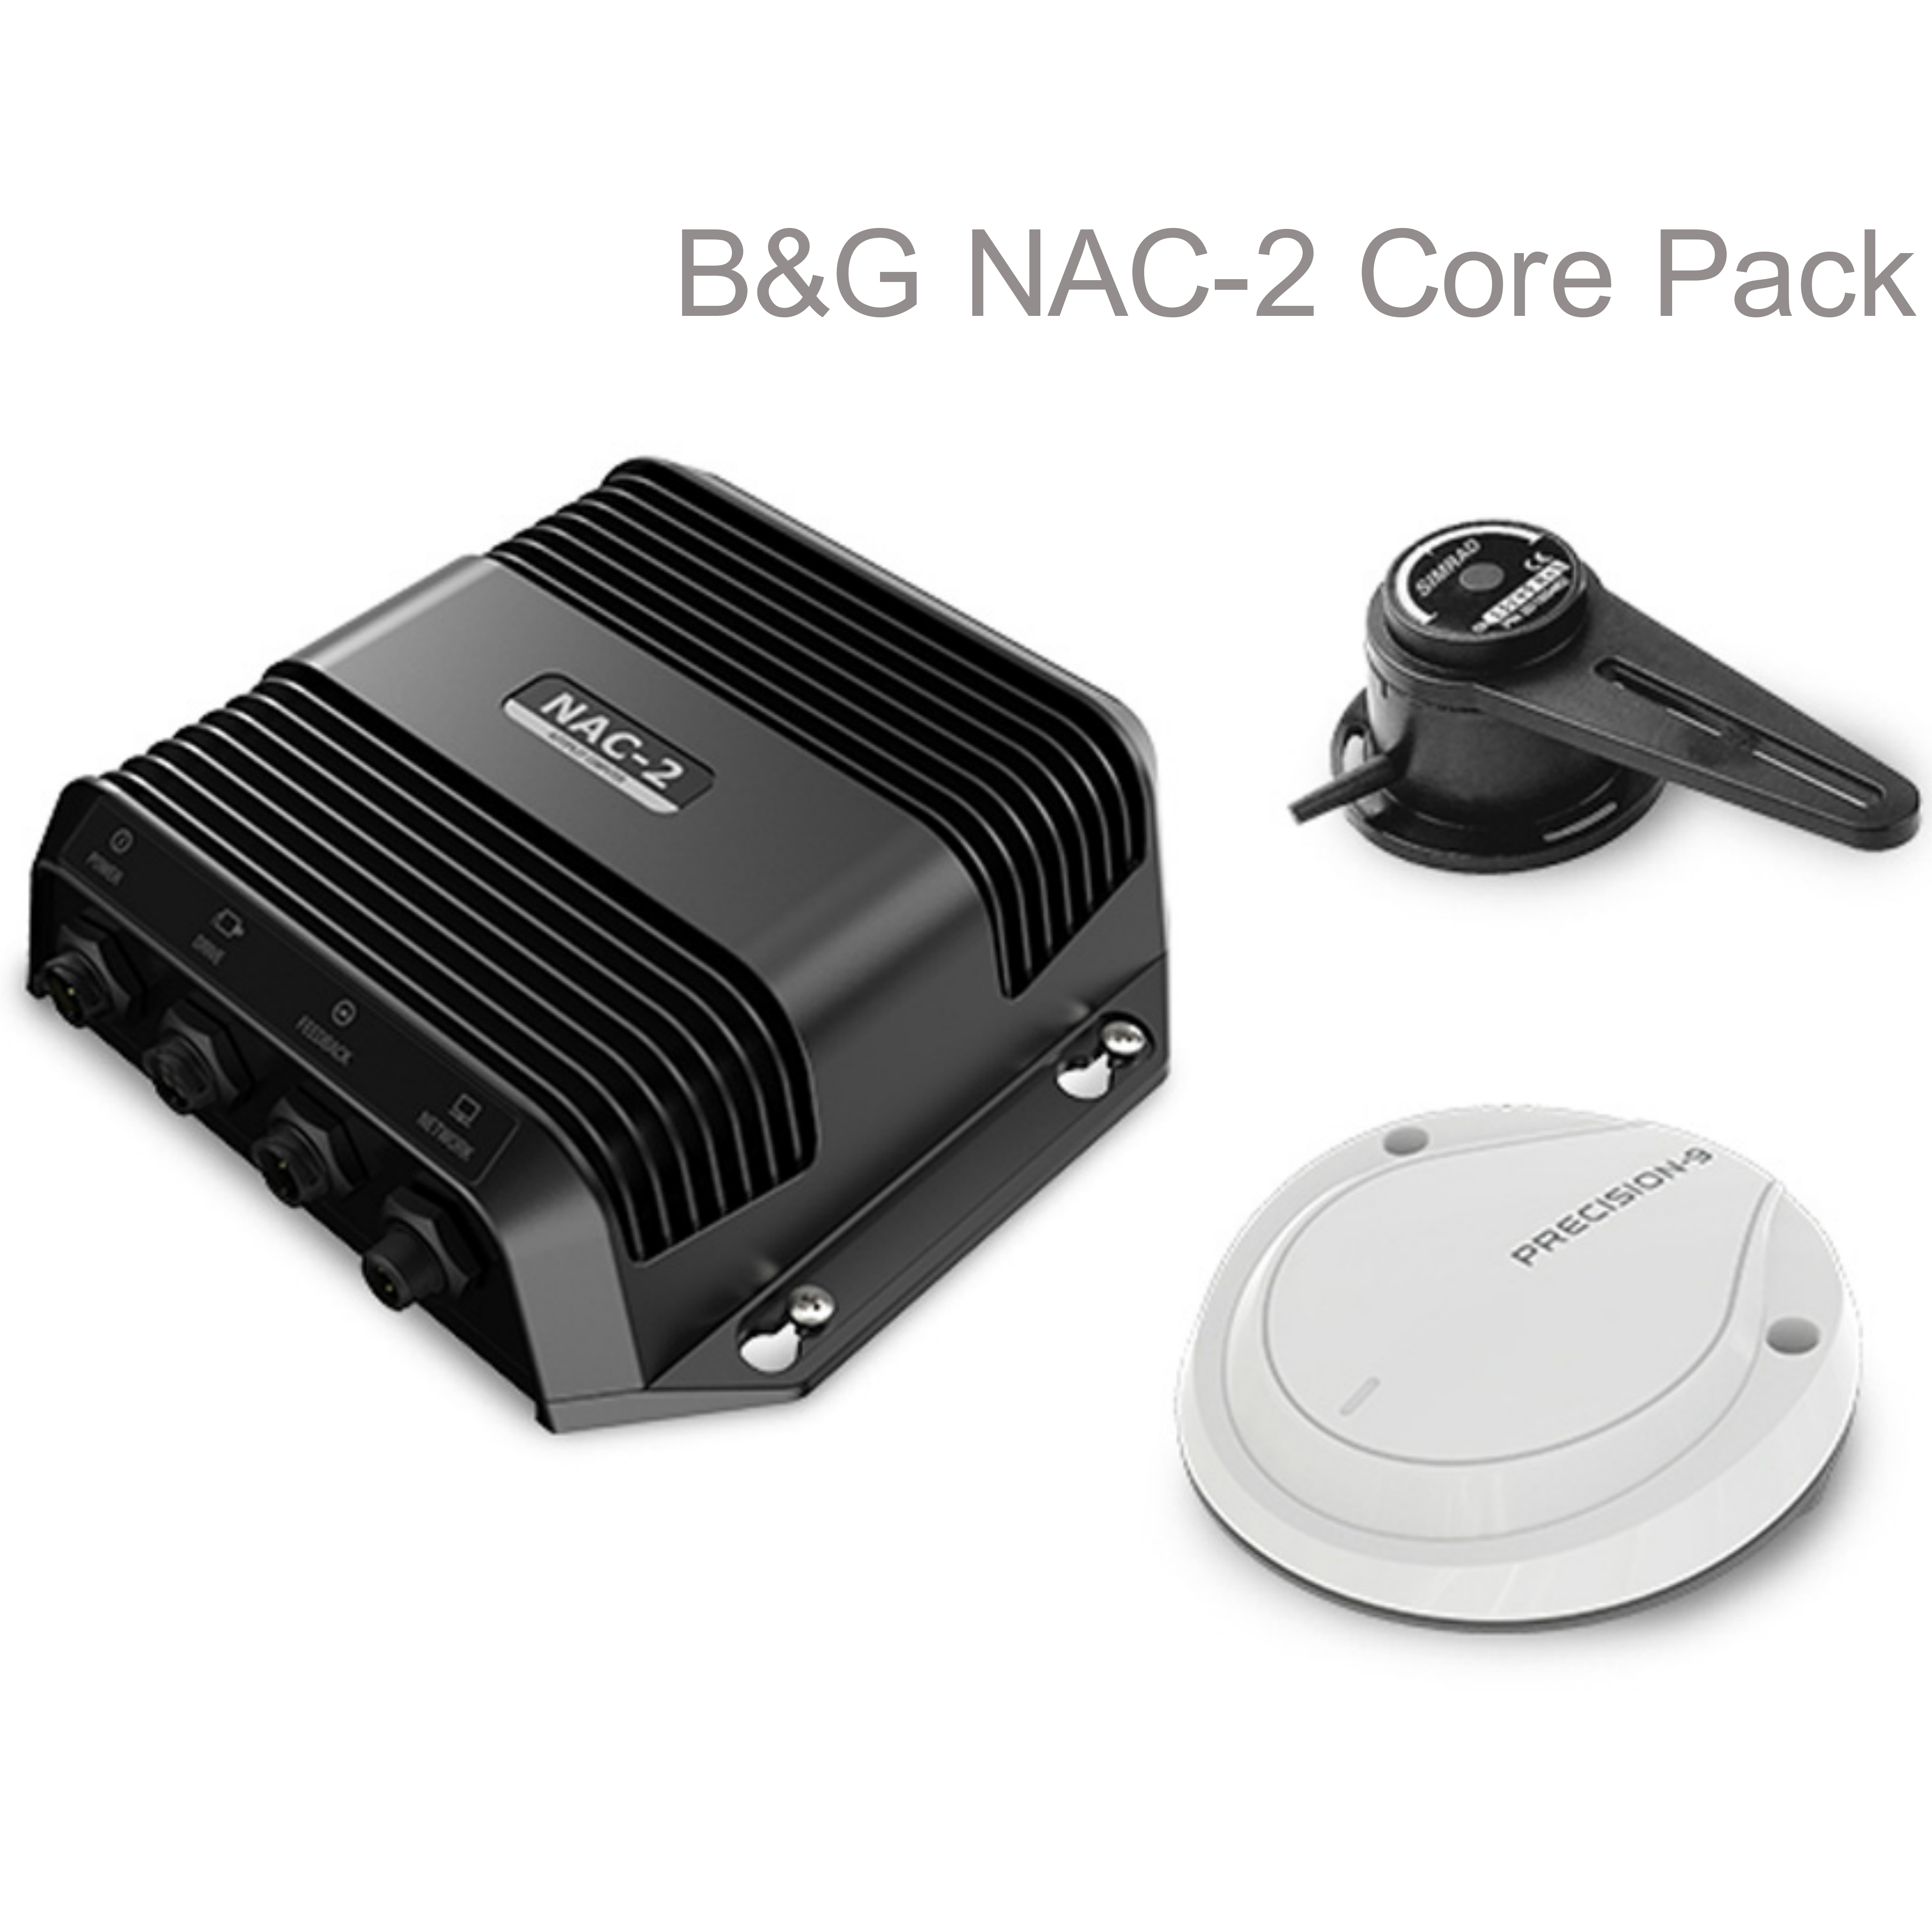 B&G 00013335001|NAC-2 Core Pack - Precision-9 & RF300 Rudder|Autopilot & Compass